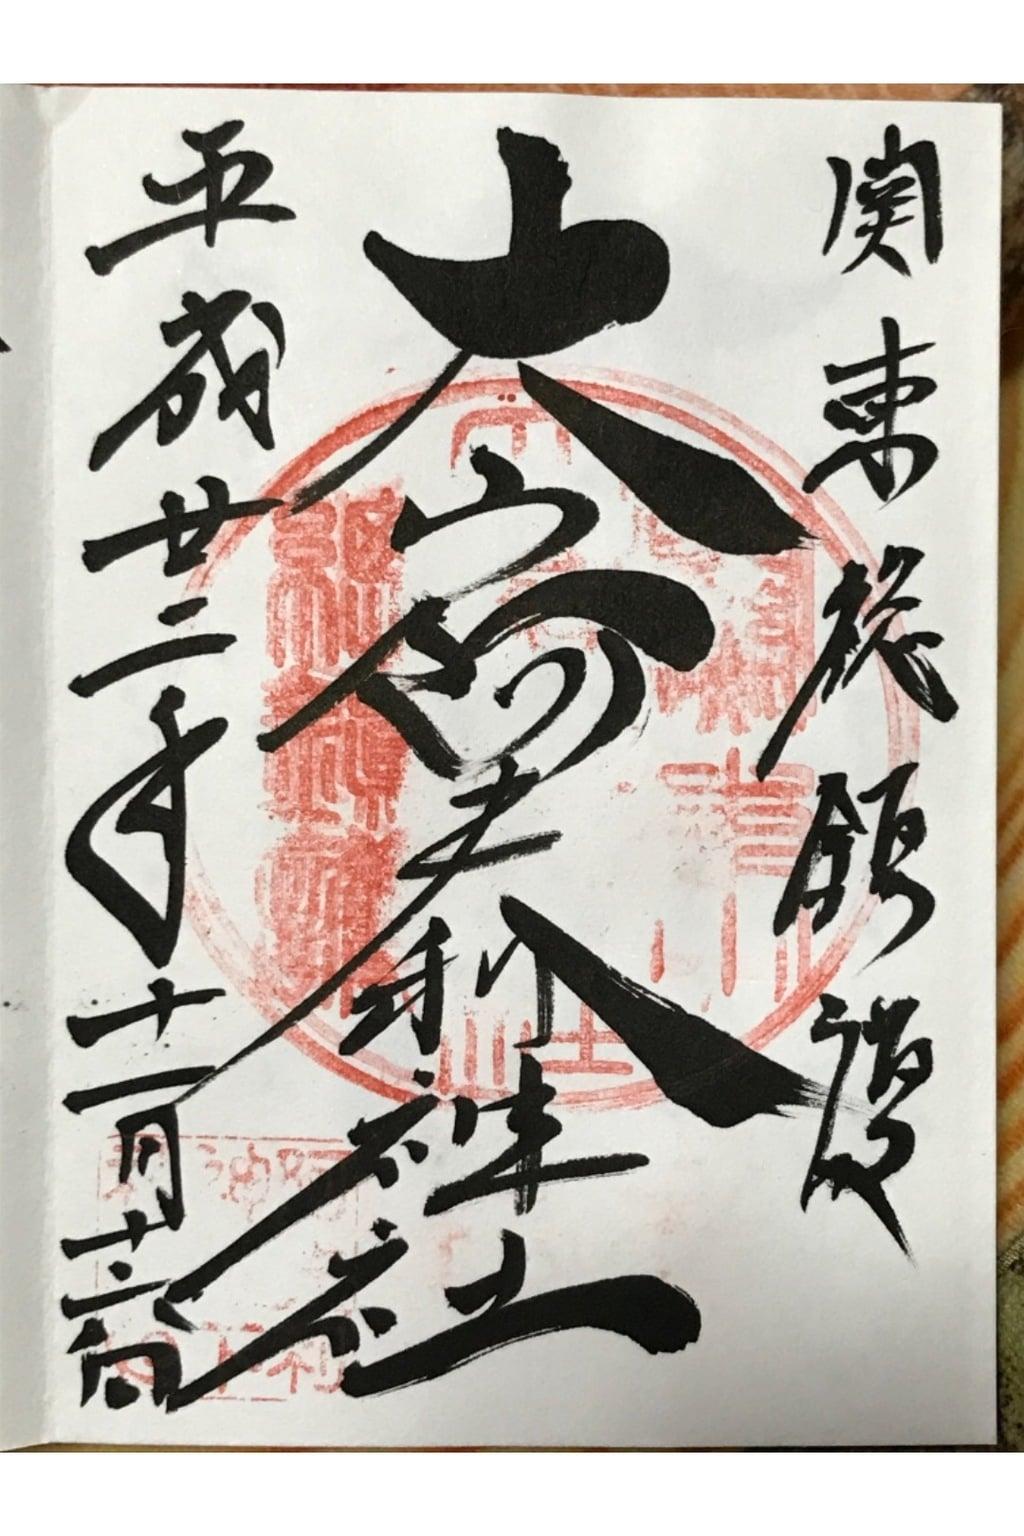 大山阿夫利神社の御朱印